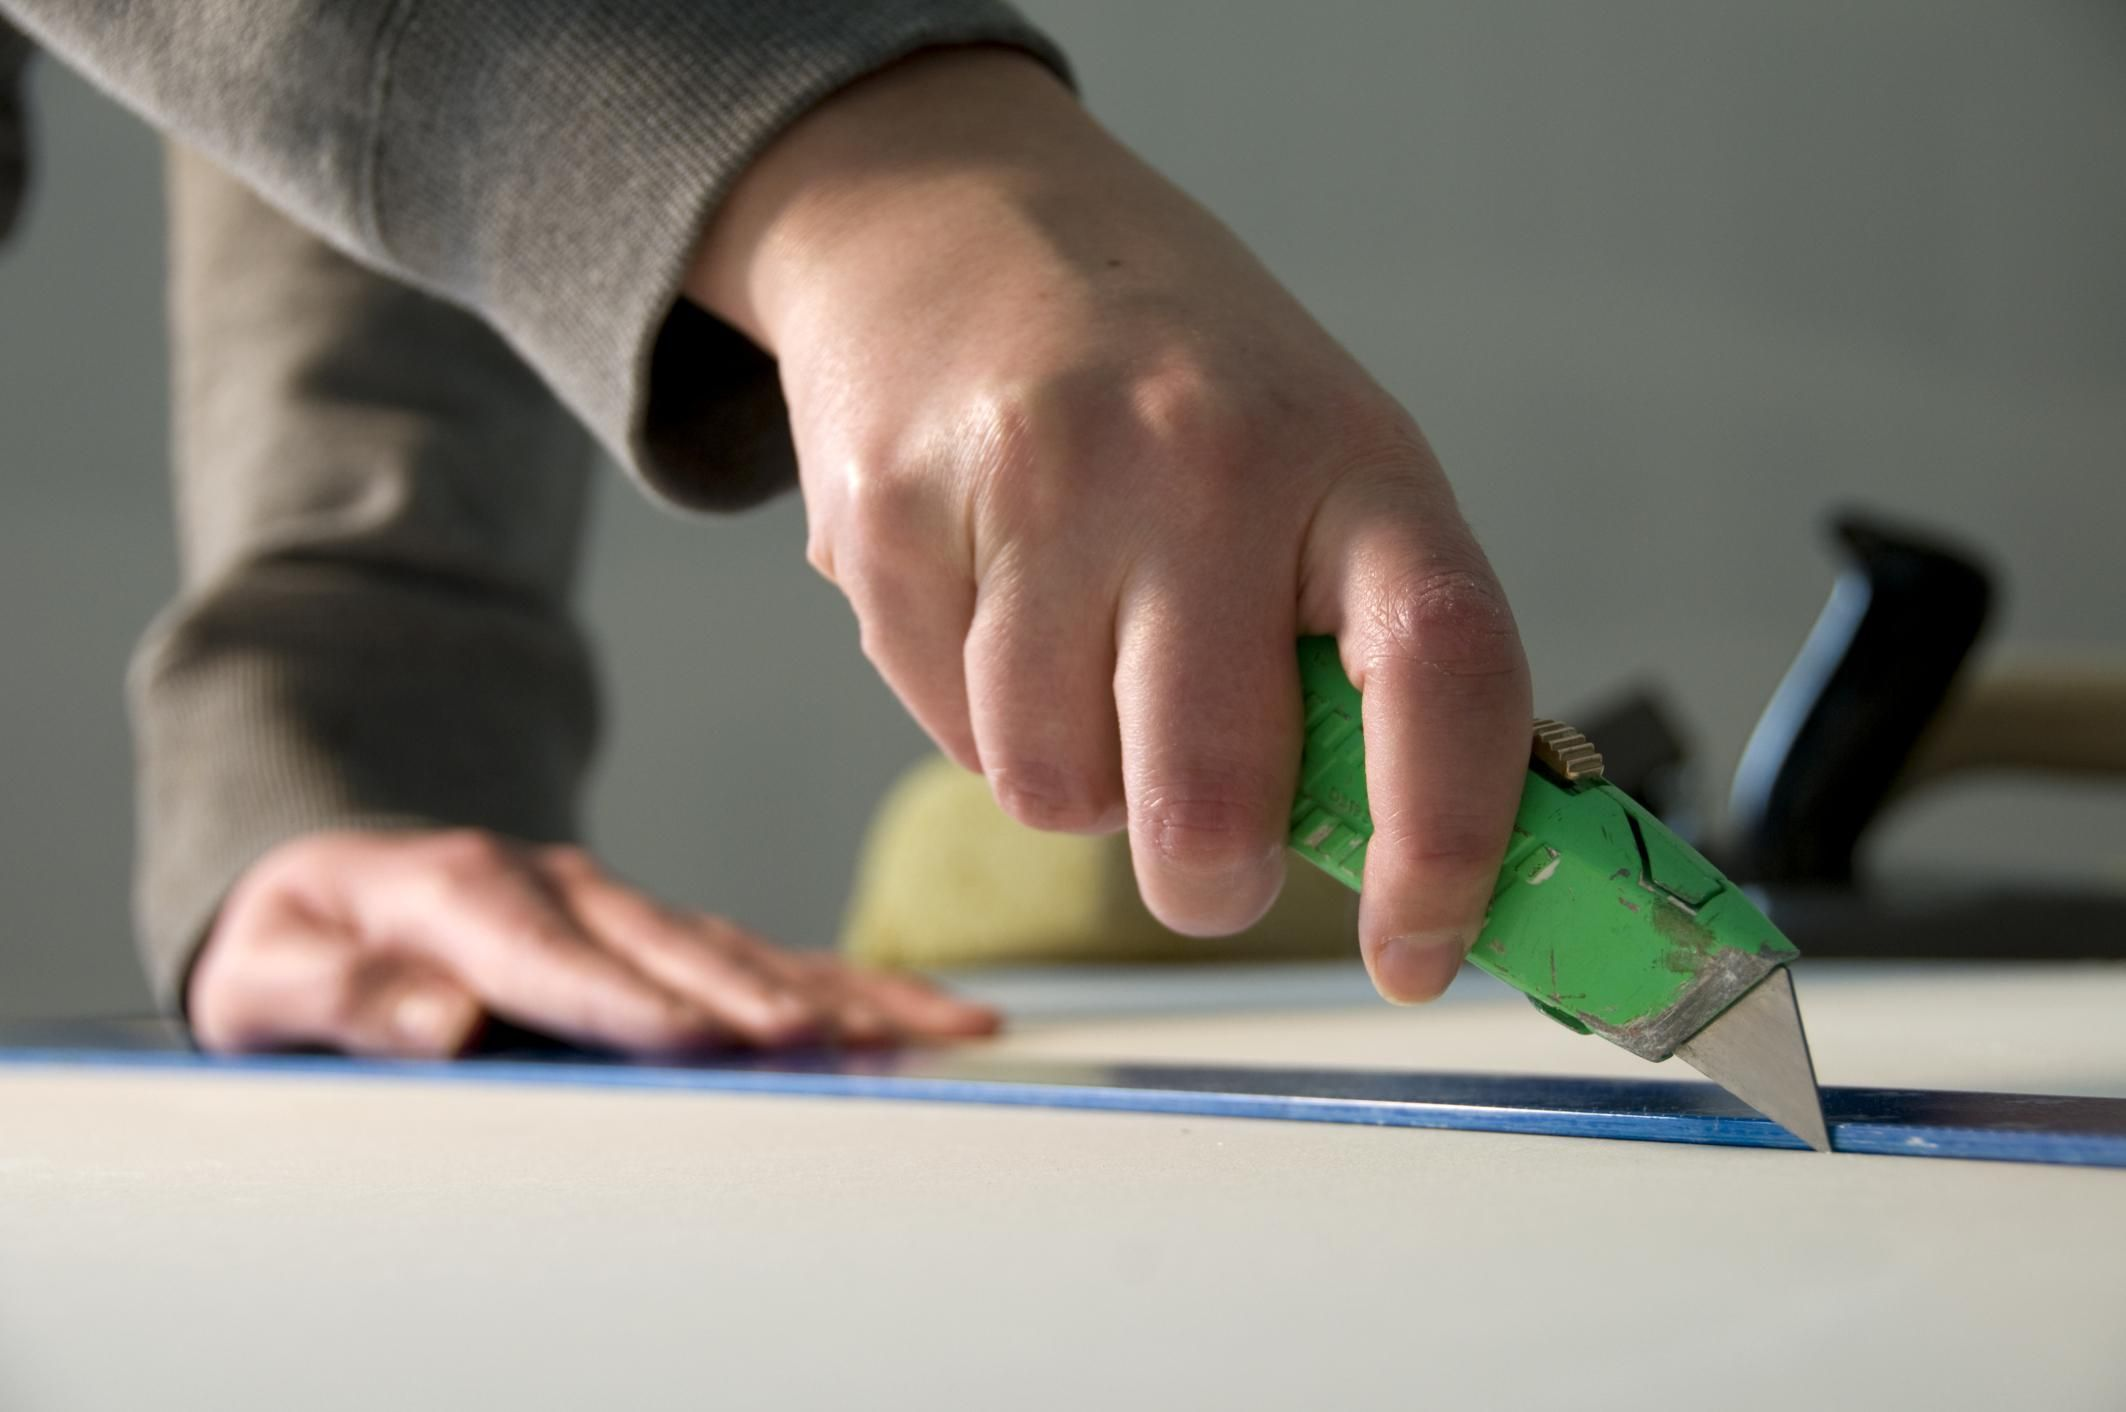 Tips For Making Drywall Mud Dry Faster Model Trains Styrene Plastic Repair Drywall Hole